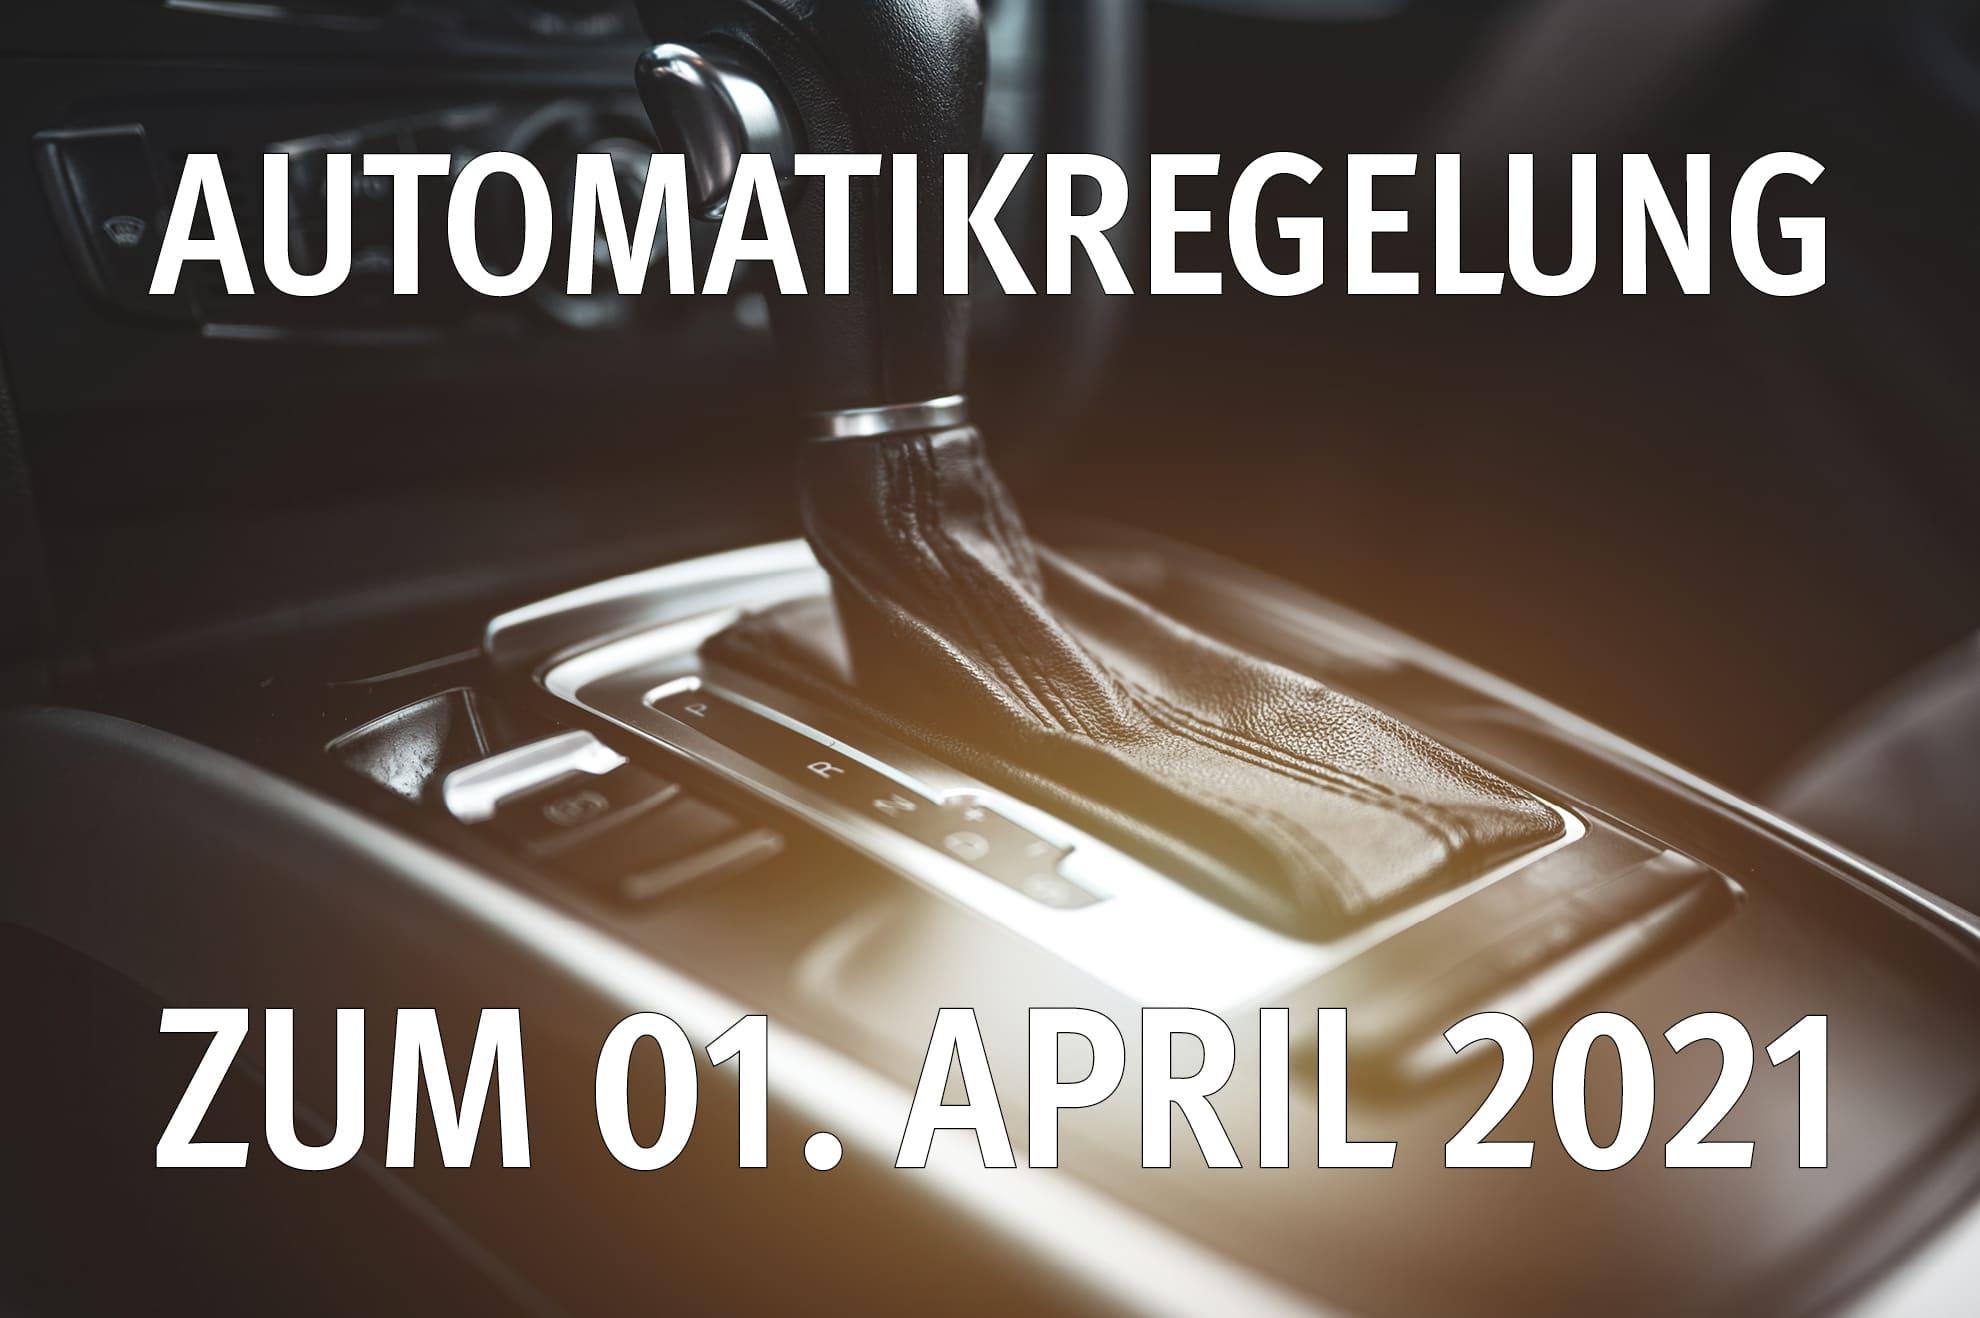 Automatikregelung ab 2021